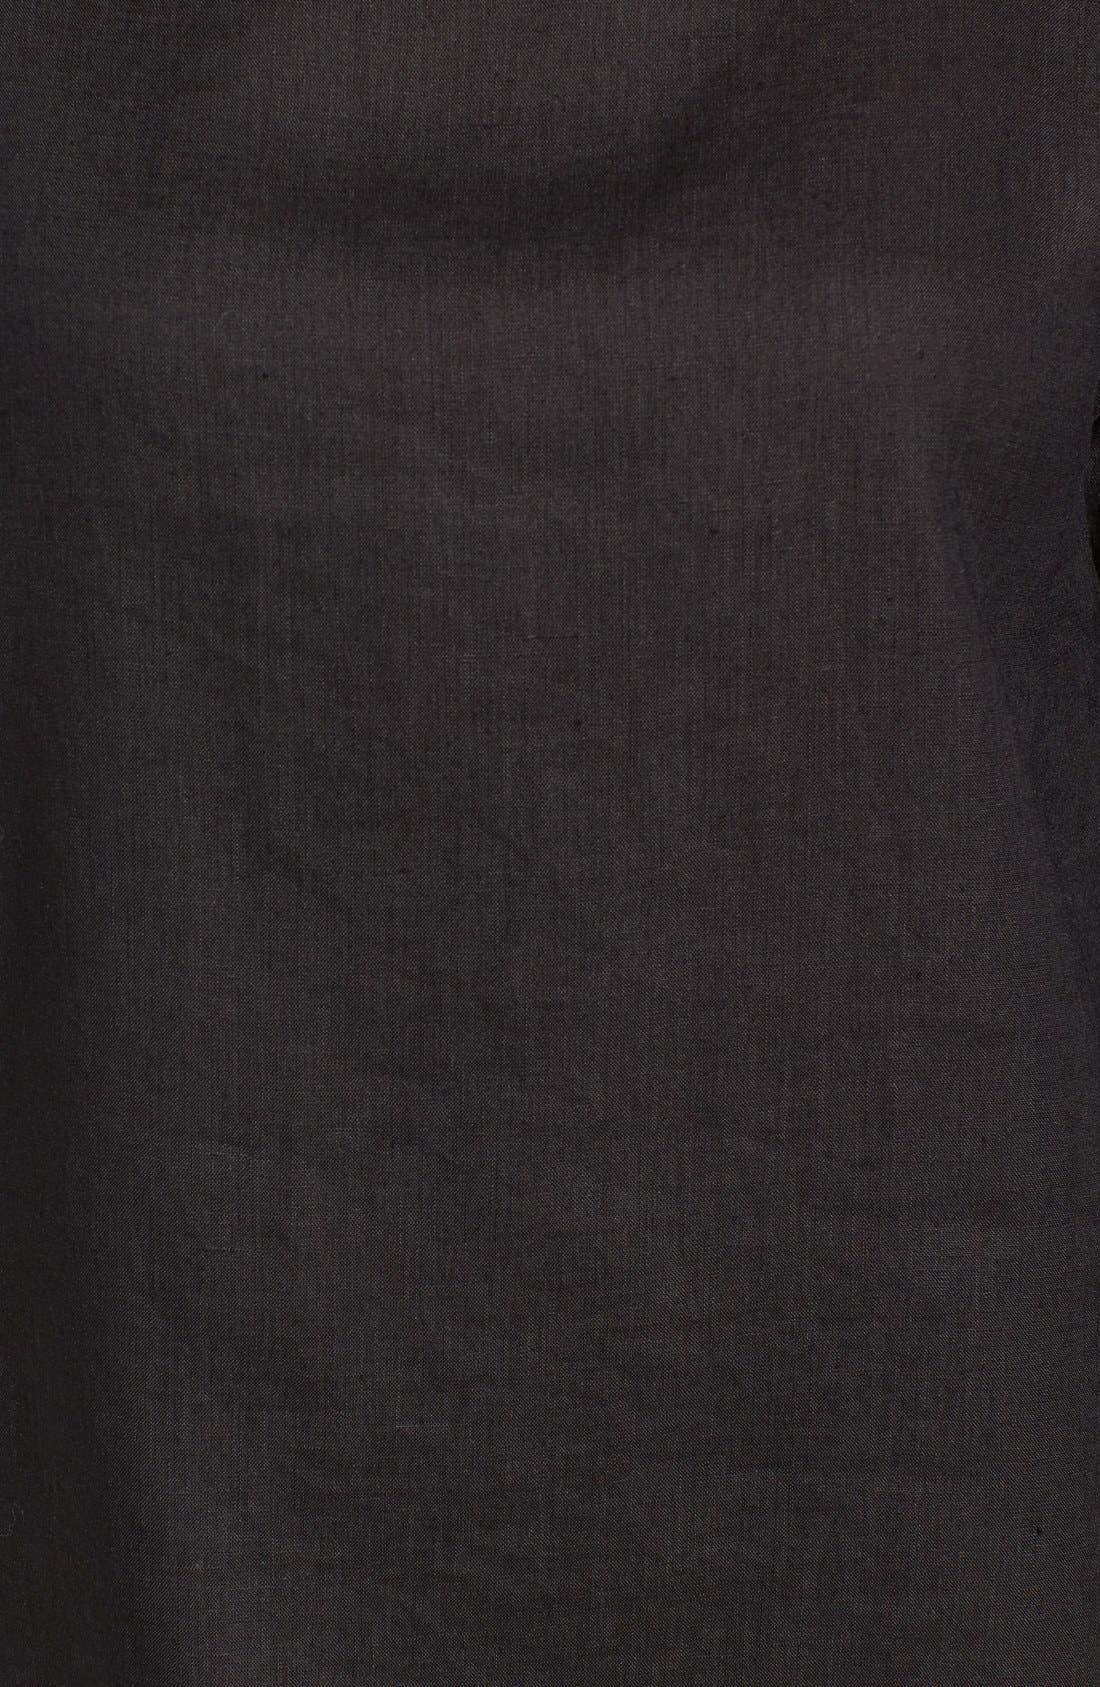 Organic Handkerchief Linen Top,                             Alternate thumbnail 10, color,                             001